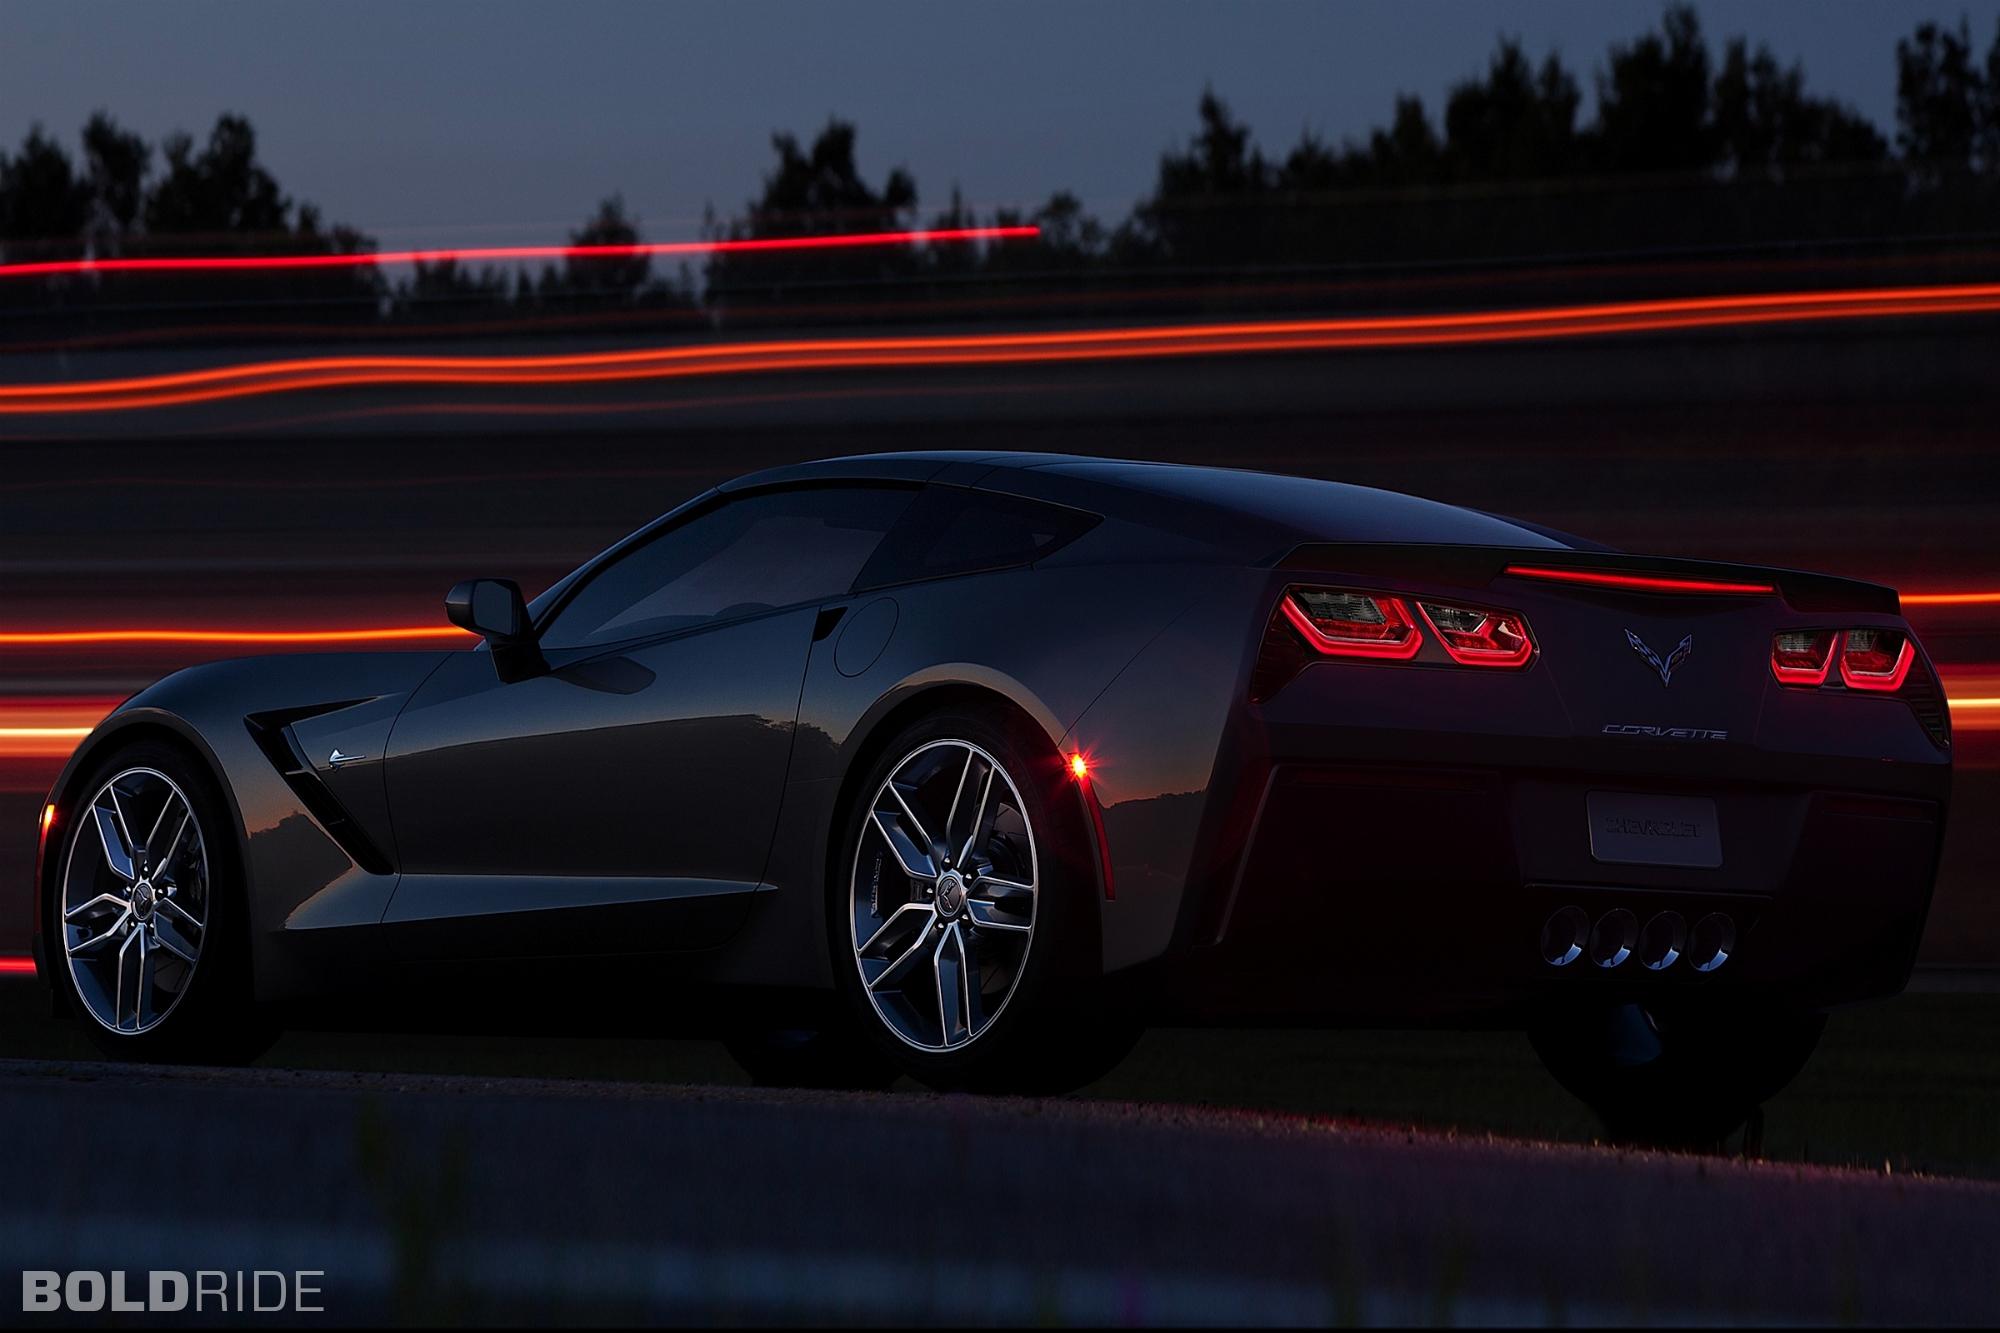 Corvette Stingray Wallpaper Car Wallpapers 2000x1333